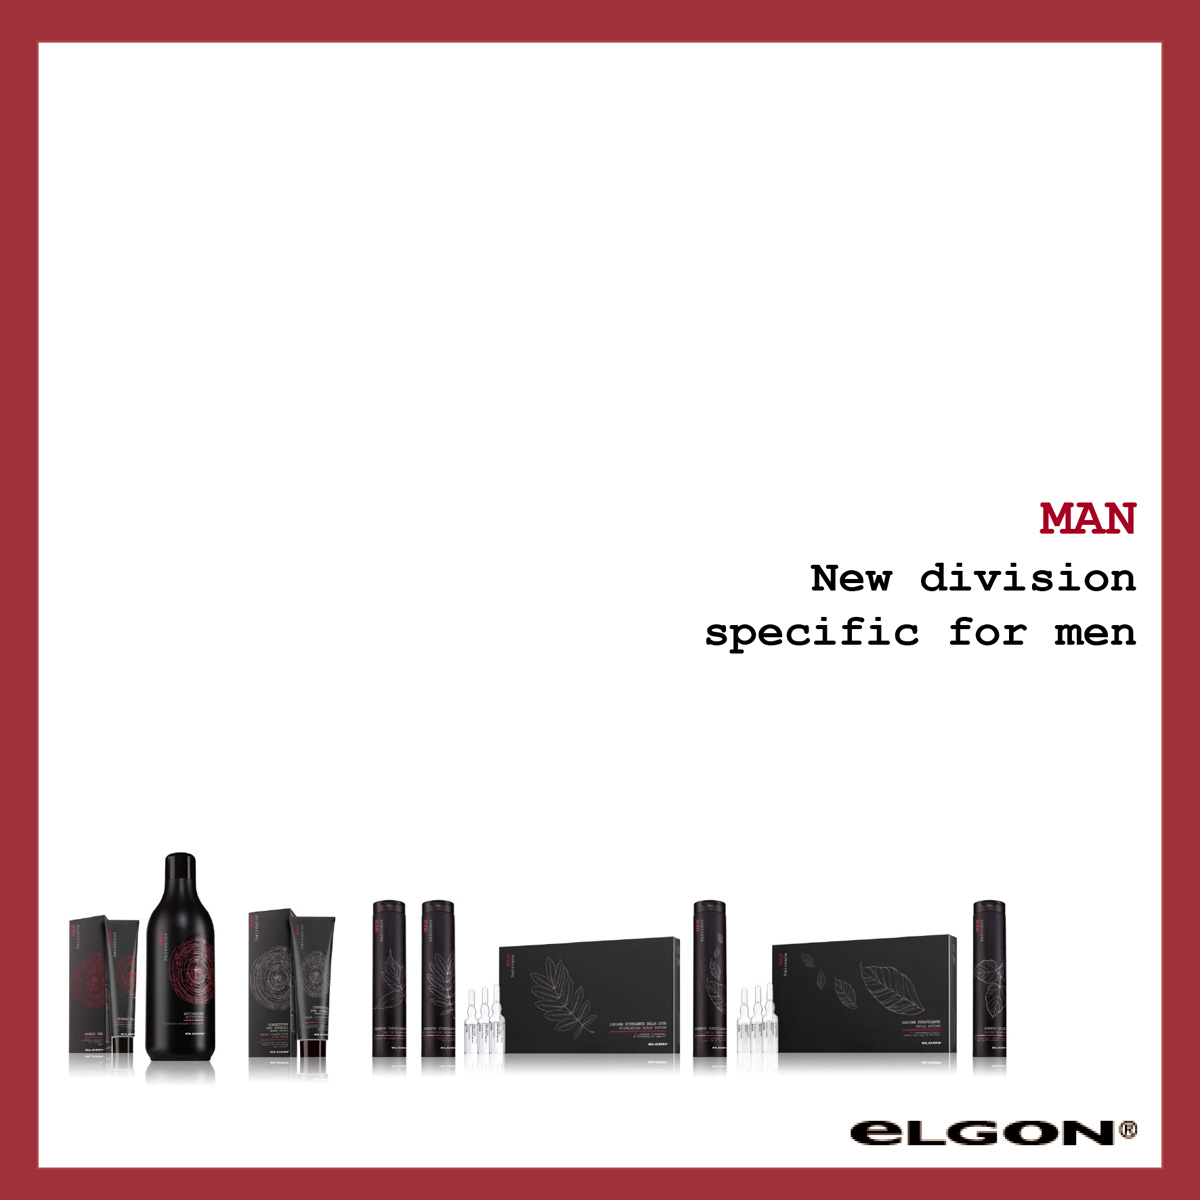 Elgon Man Presentation-1.jpg